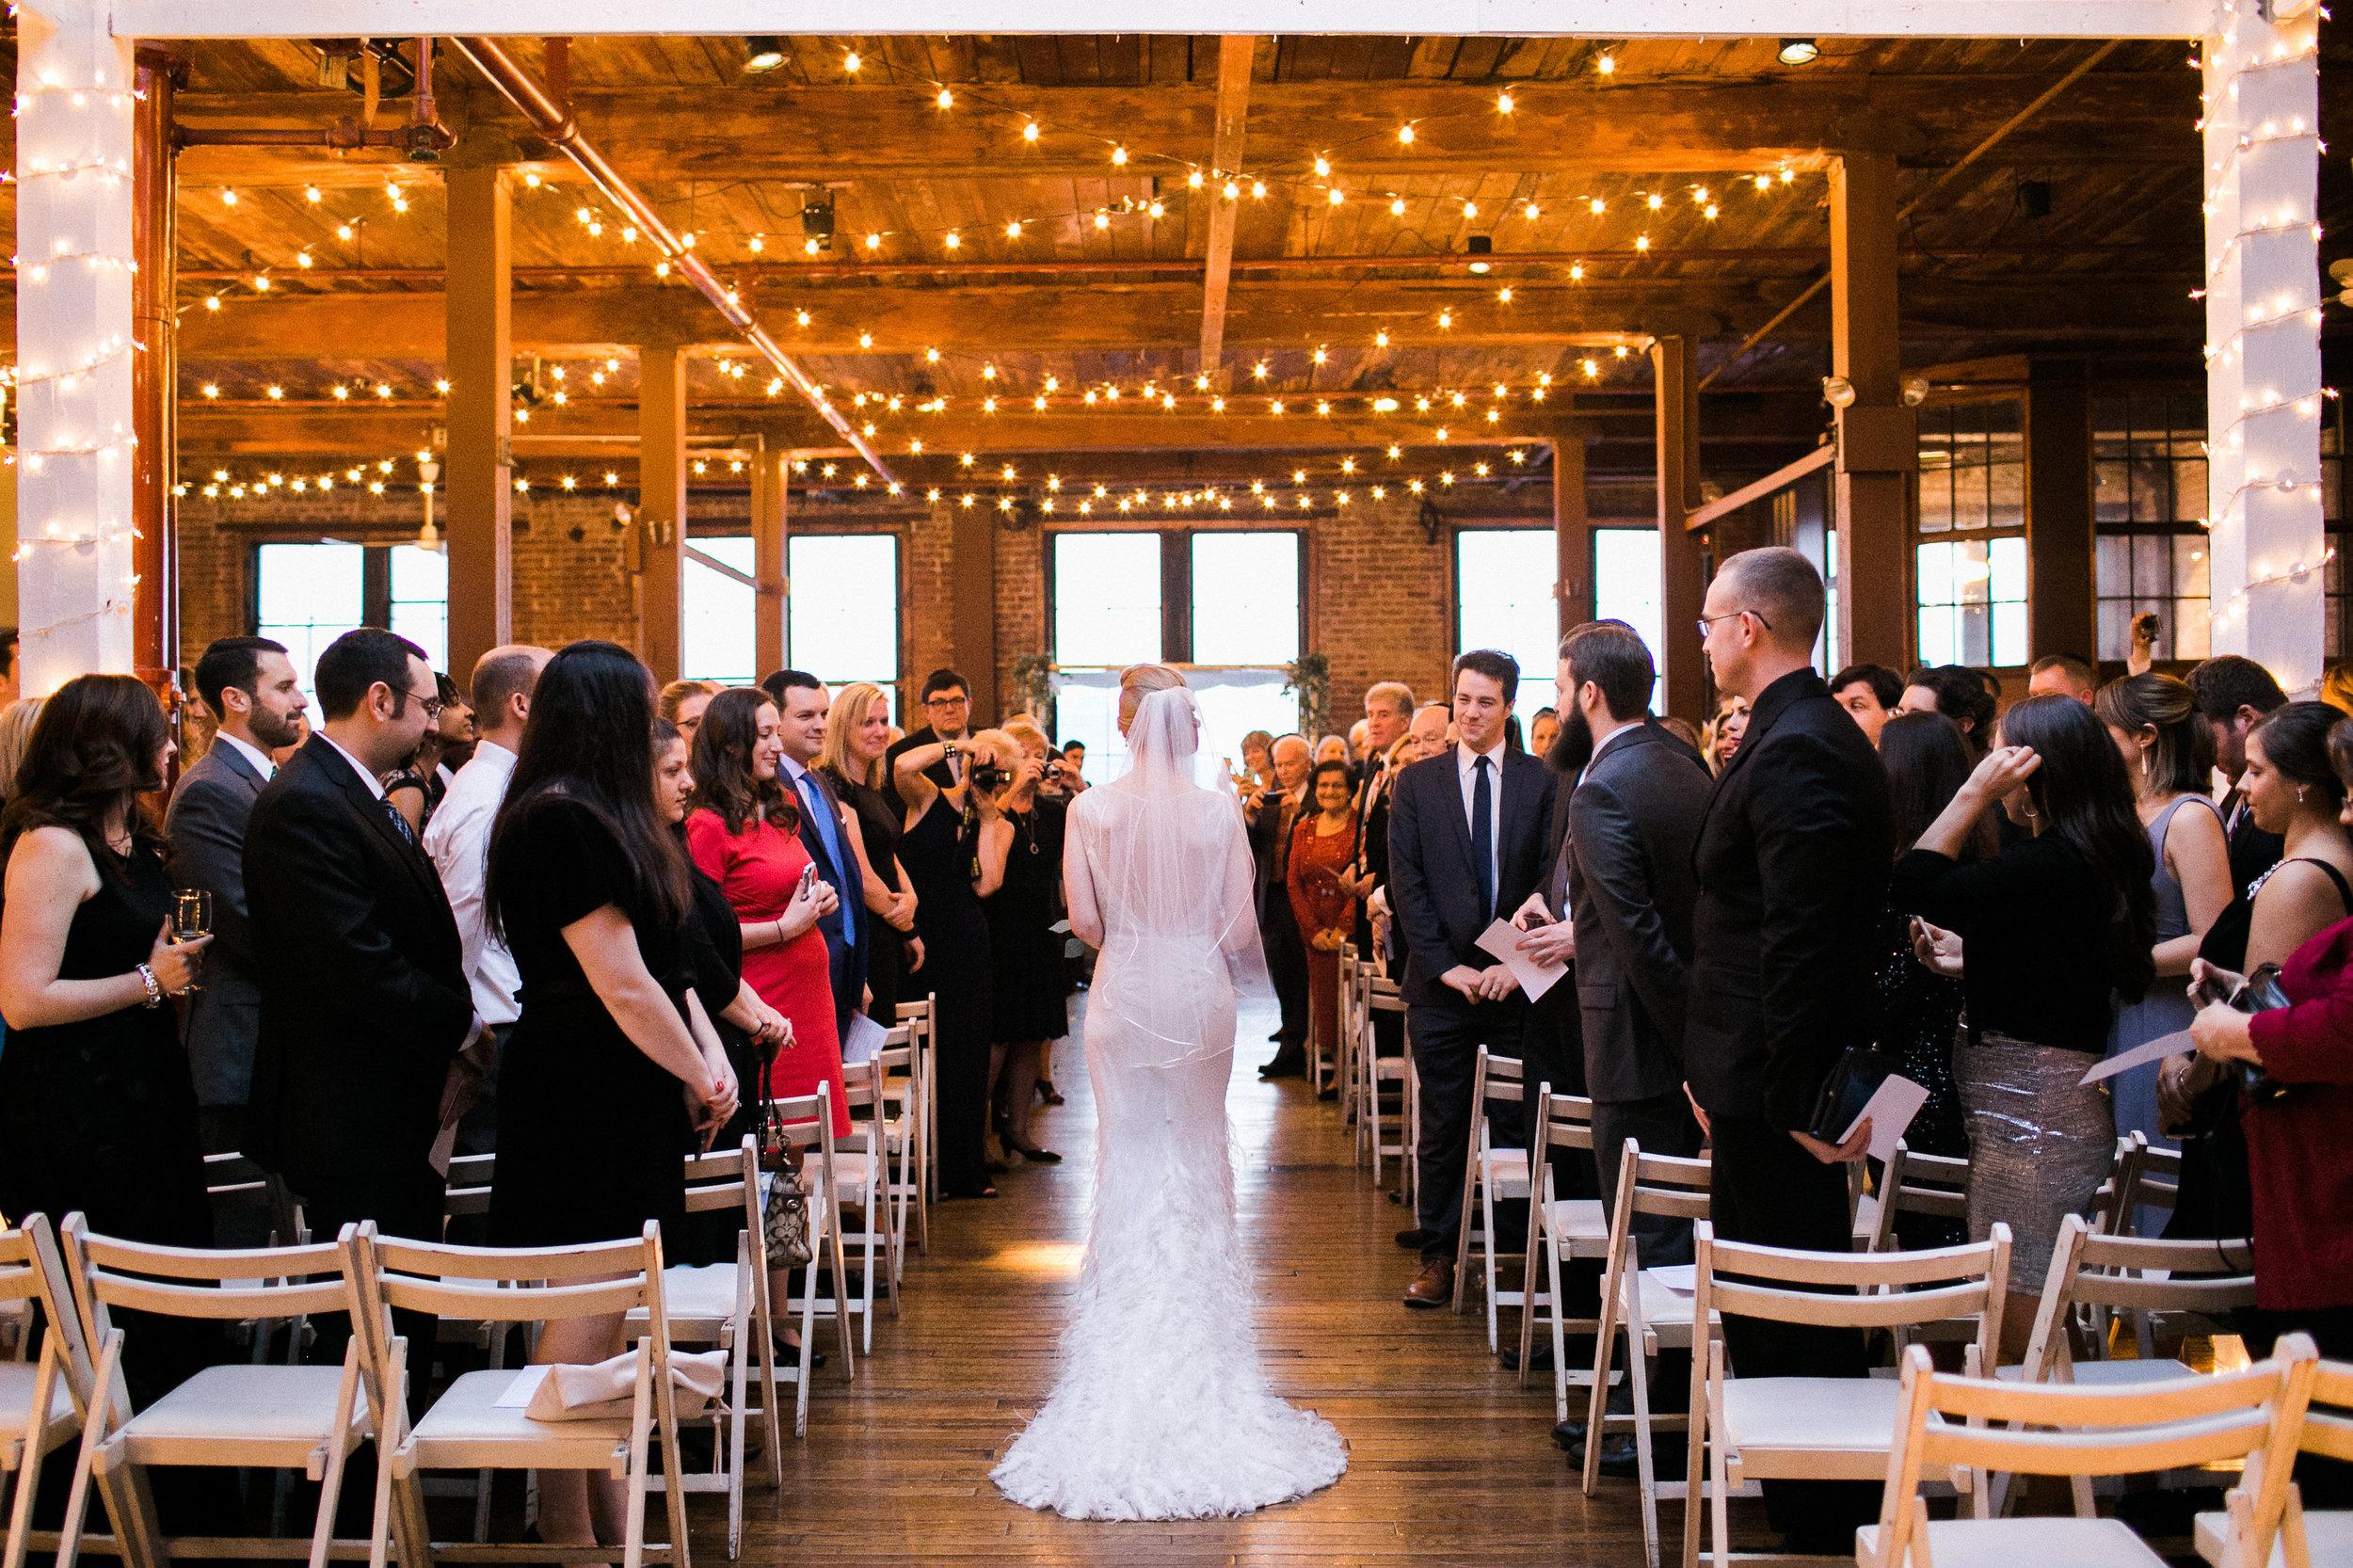 sam-and-jon_metropolitan-building-nyc-wedding-19-8.jpg